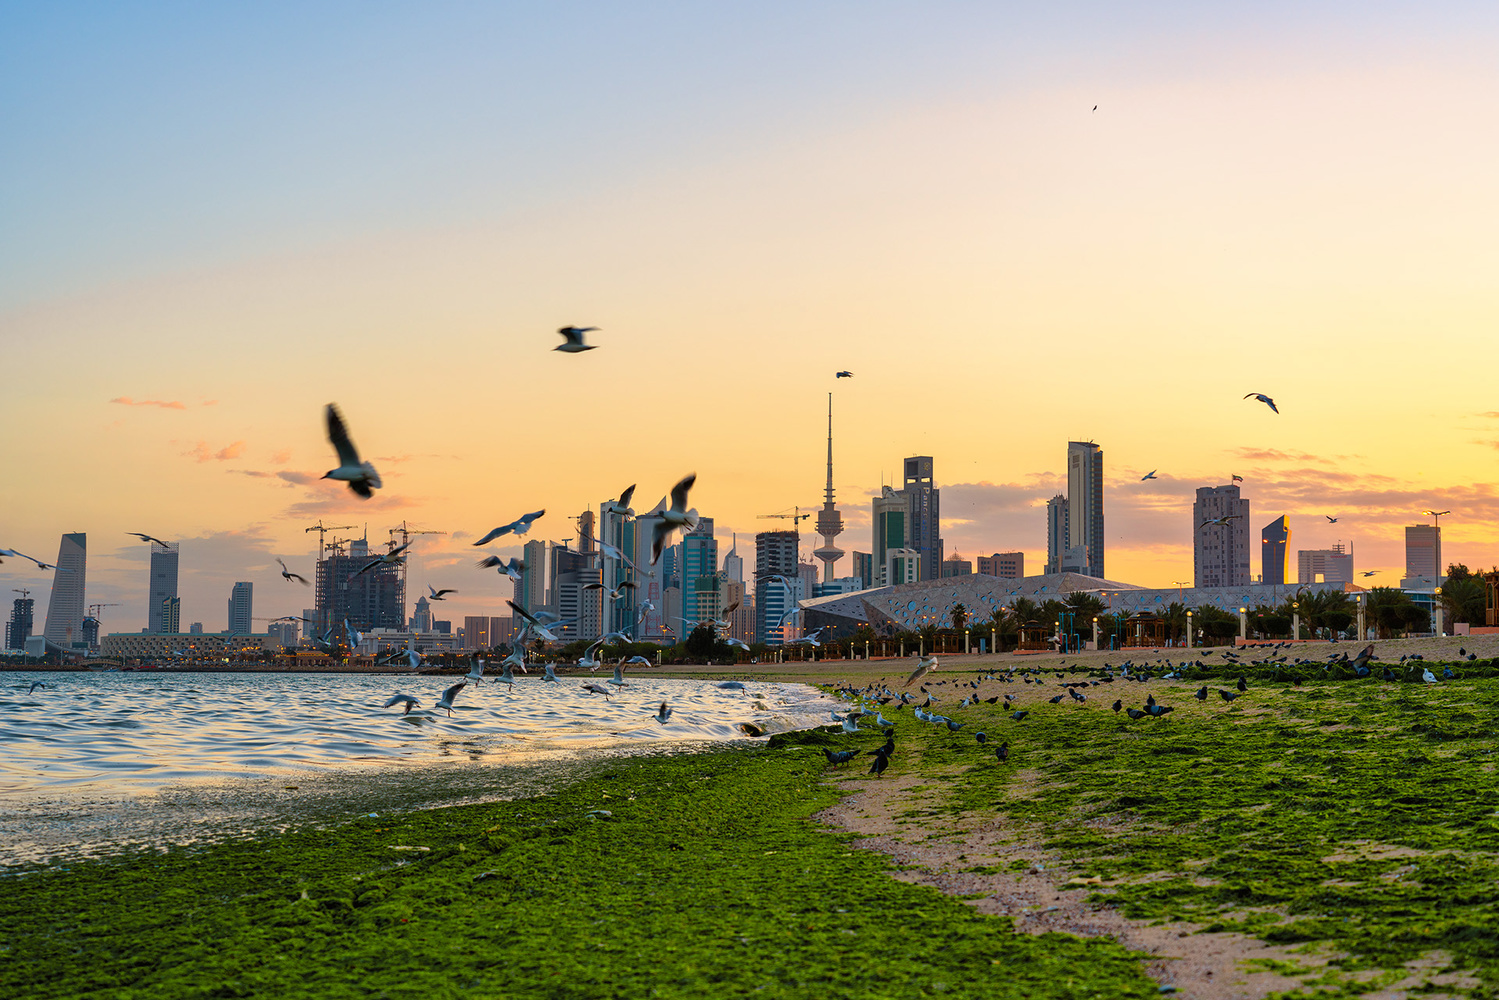 Kuwait city by meshal alawadhi